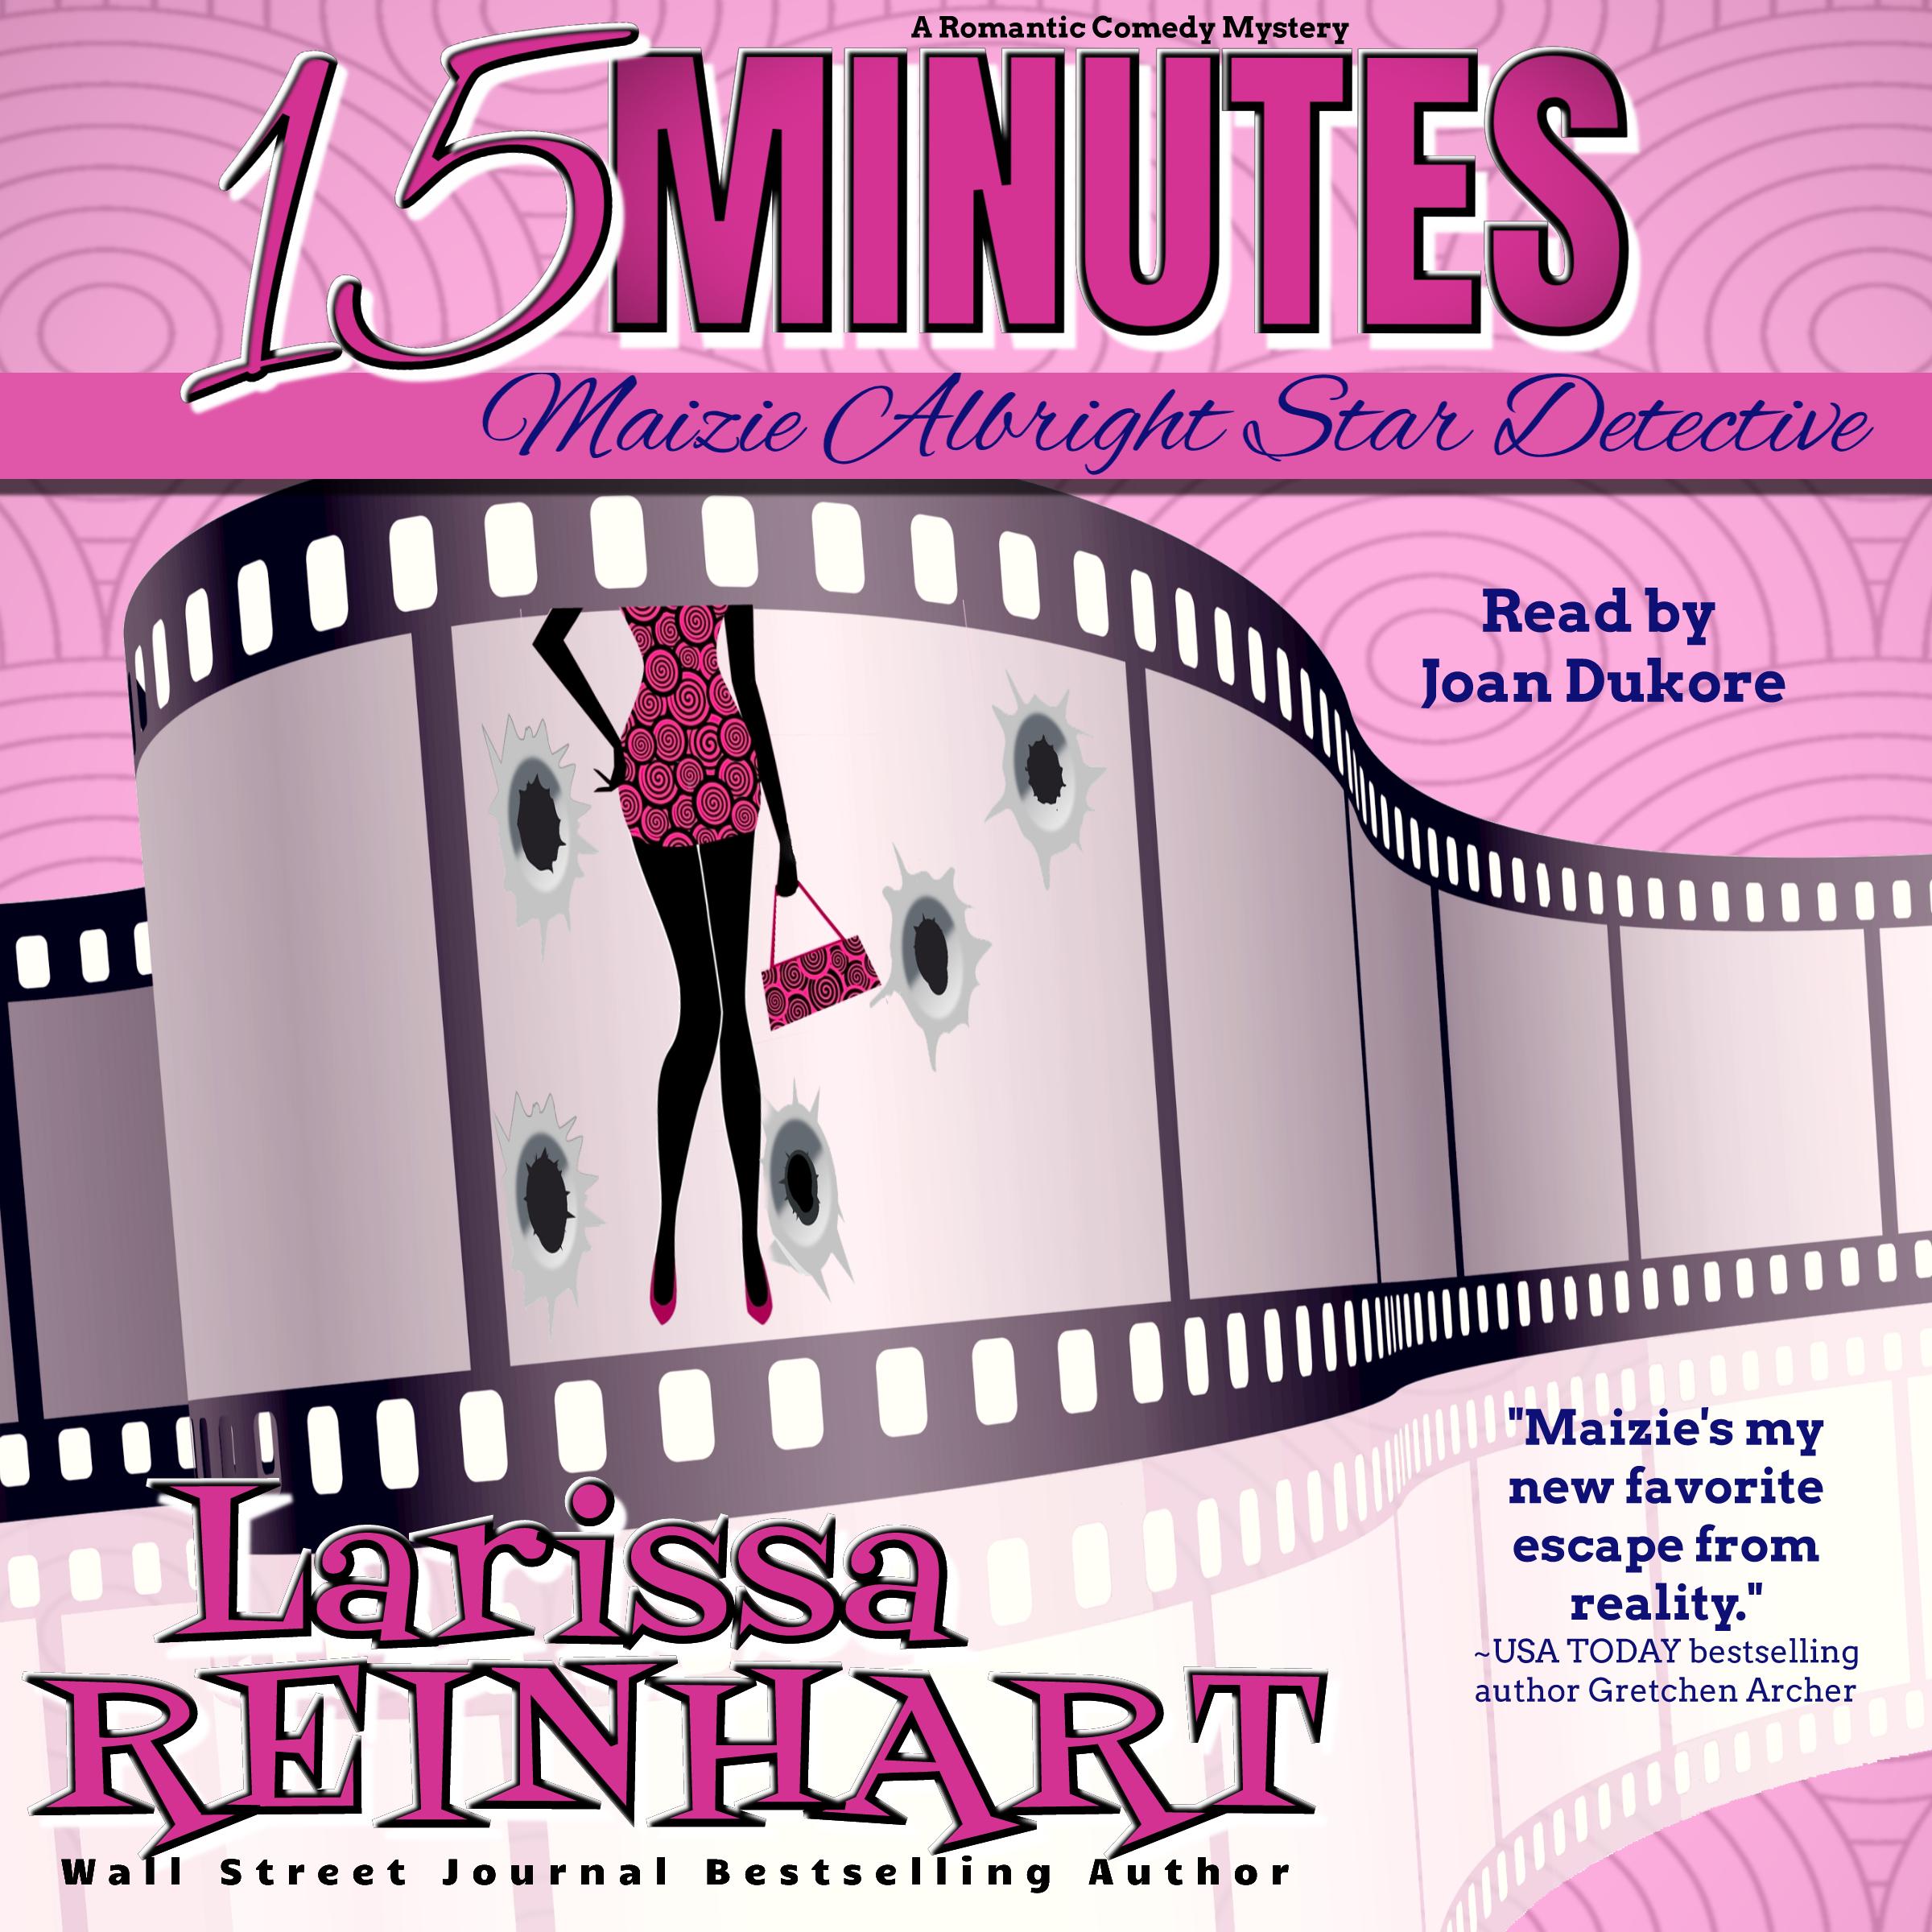 15 Minutes Audiobook